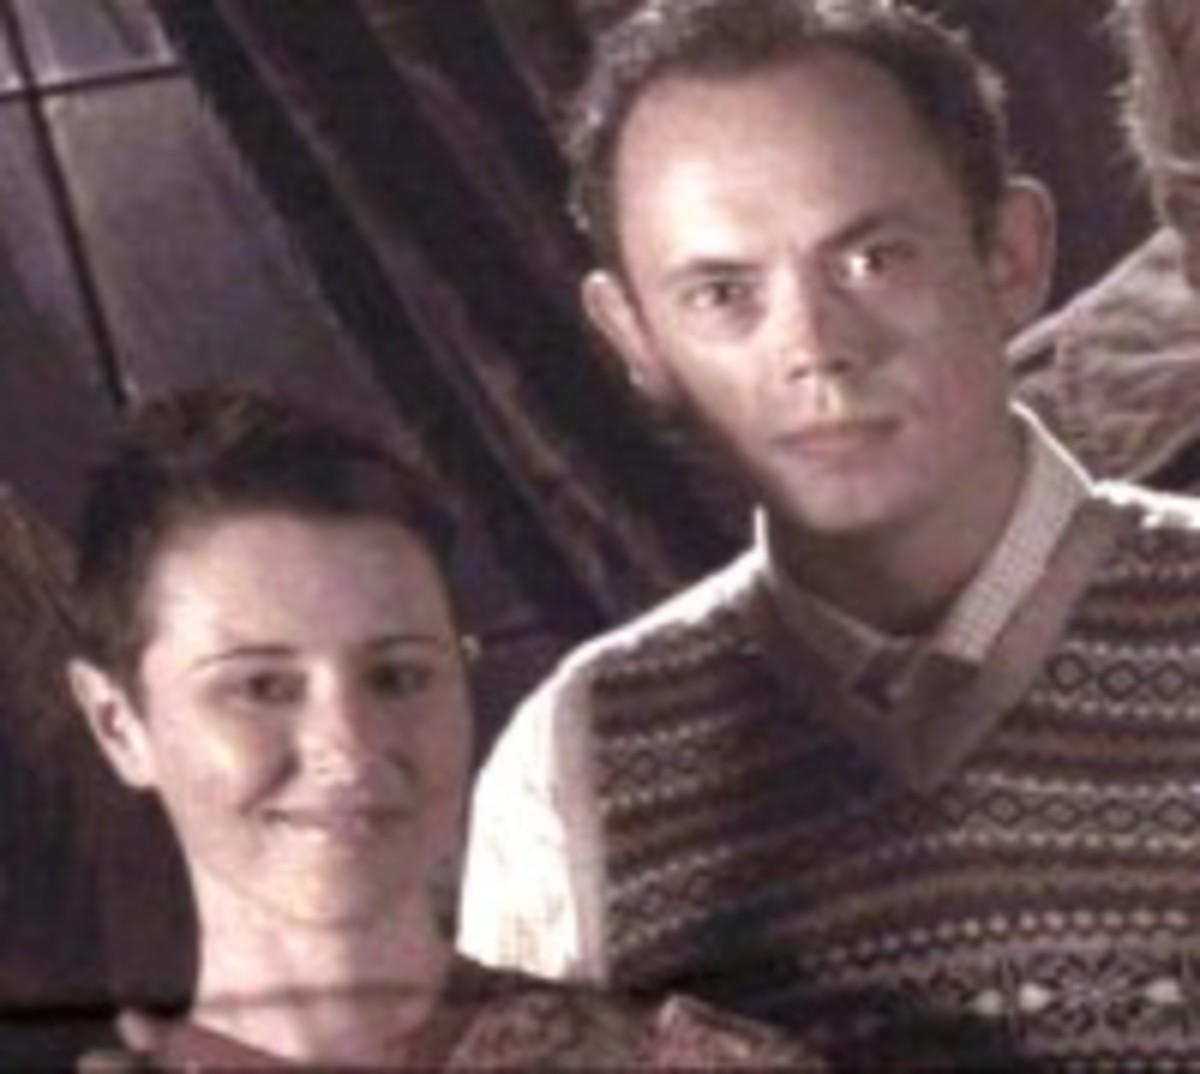 Alice and Frank Longbottom